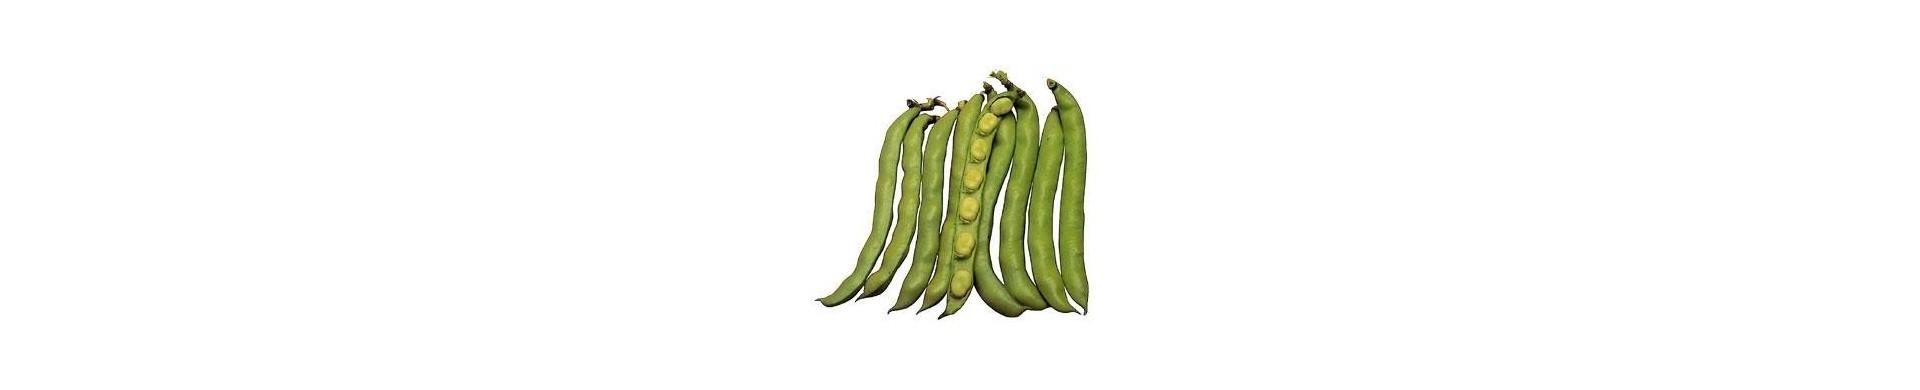 Planting bebas - Buy ben plants